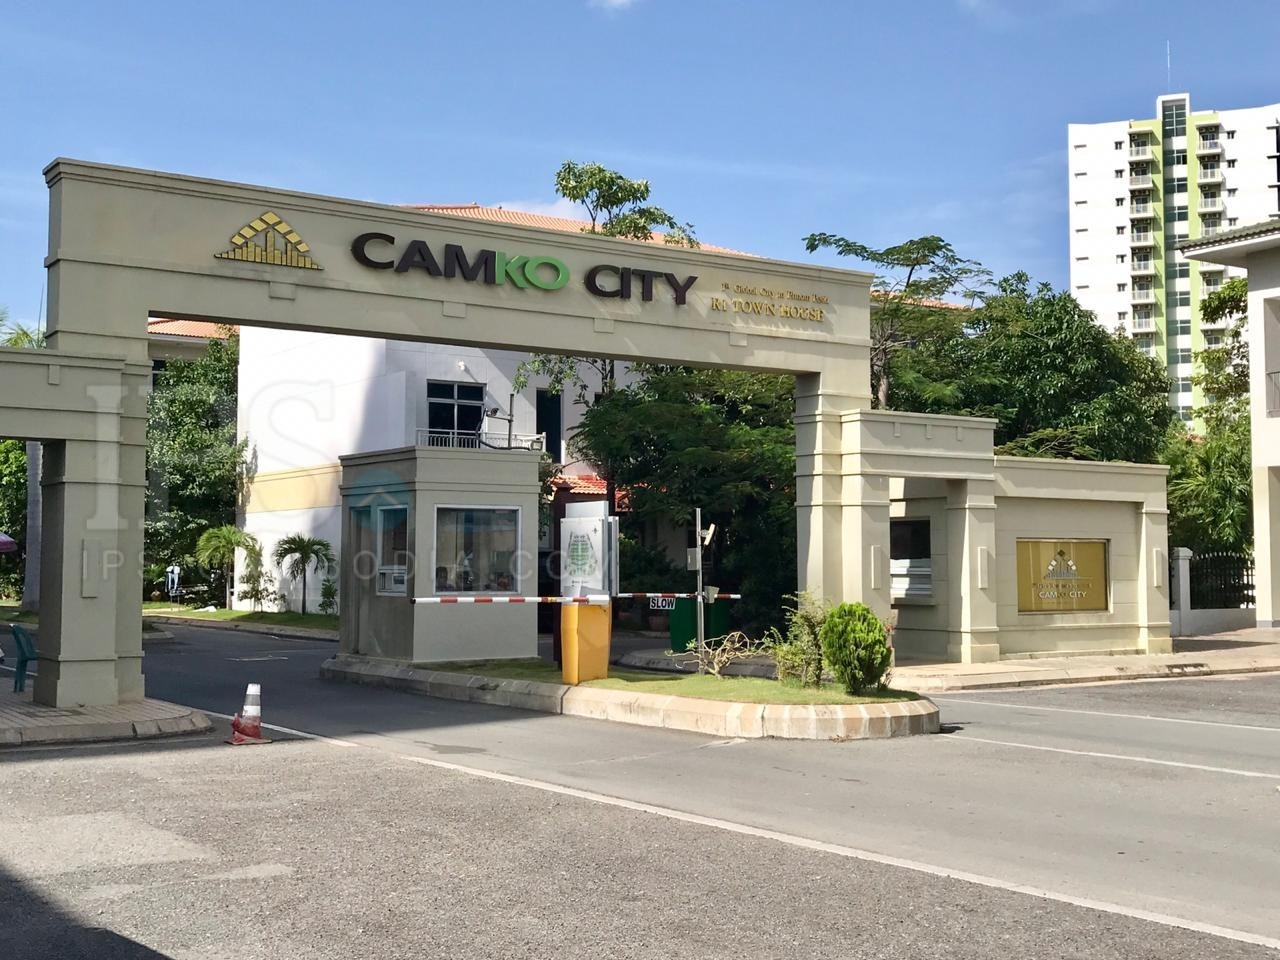 3 Bedroom Condo Unit For Sale Russey Keo Phnom Penh 9388 Ips Cambodia